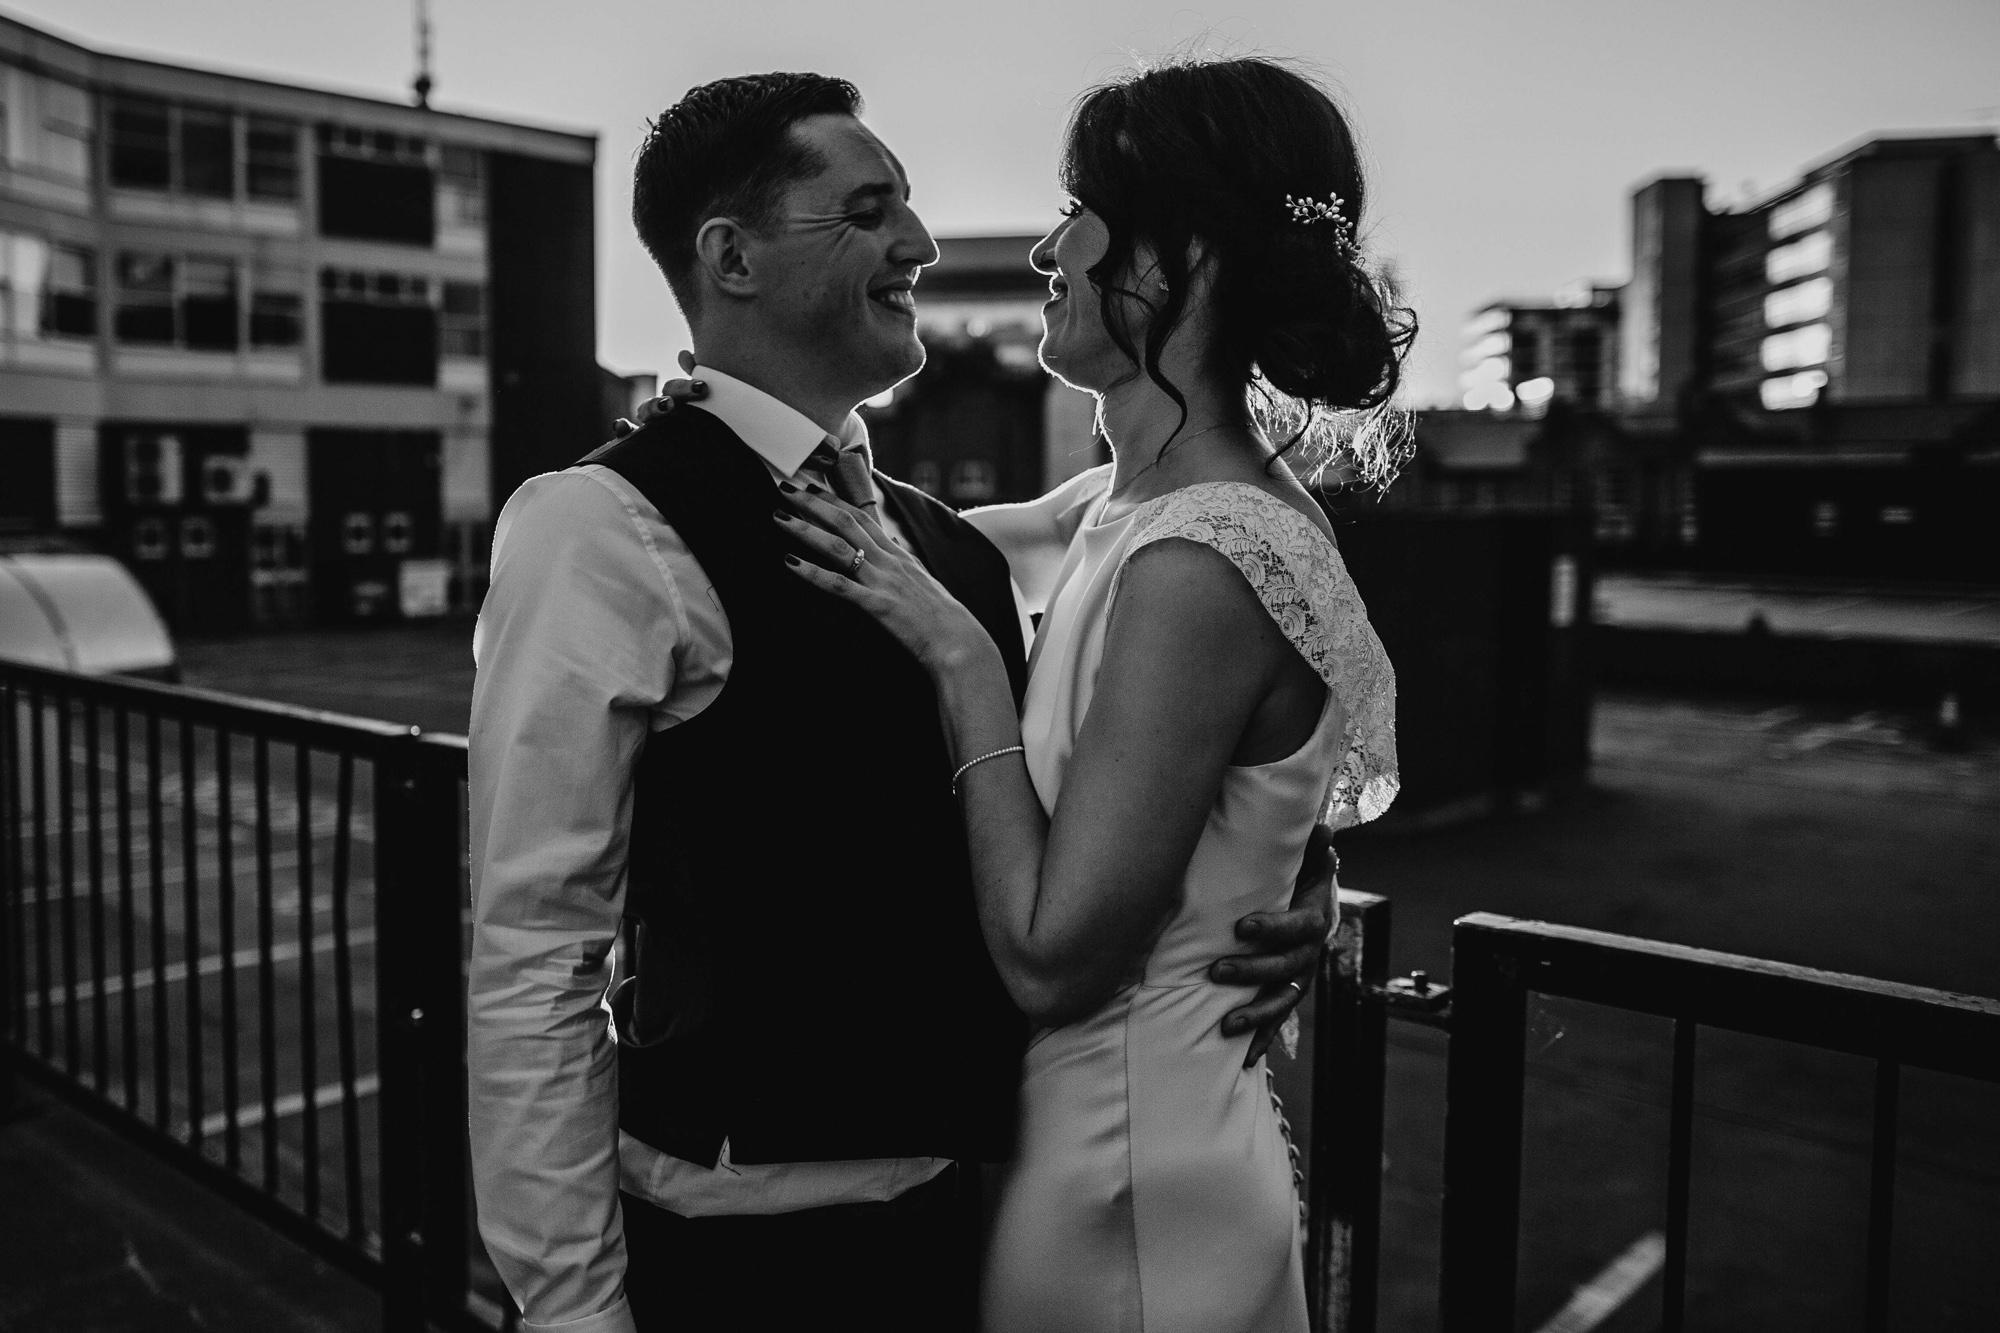 Sarah-Honeysuckle-Bias-Cut-Silk-Vintage-Inspired-Wedding-Gown-Sheffield-Wedding-Kate-Beaumont-62.jpg